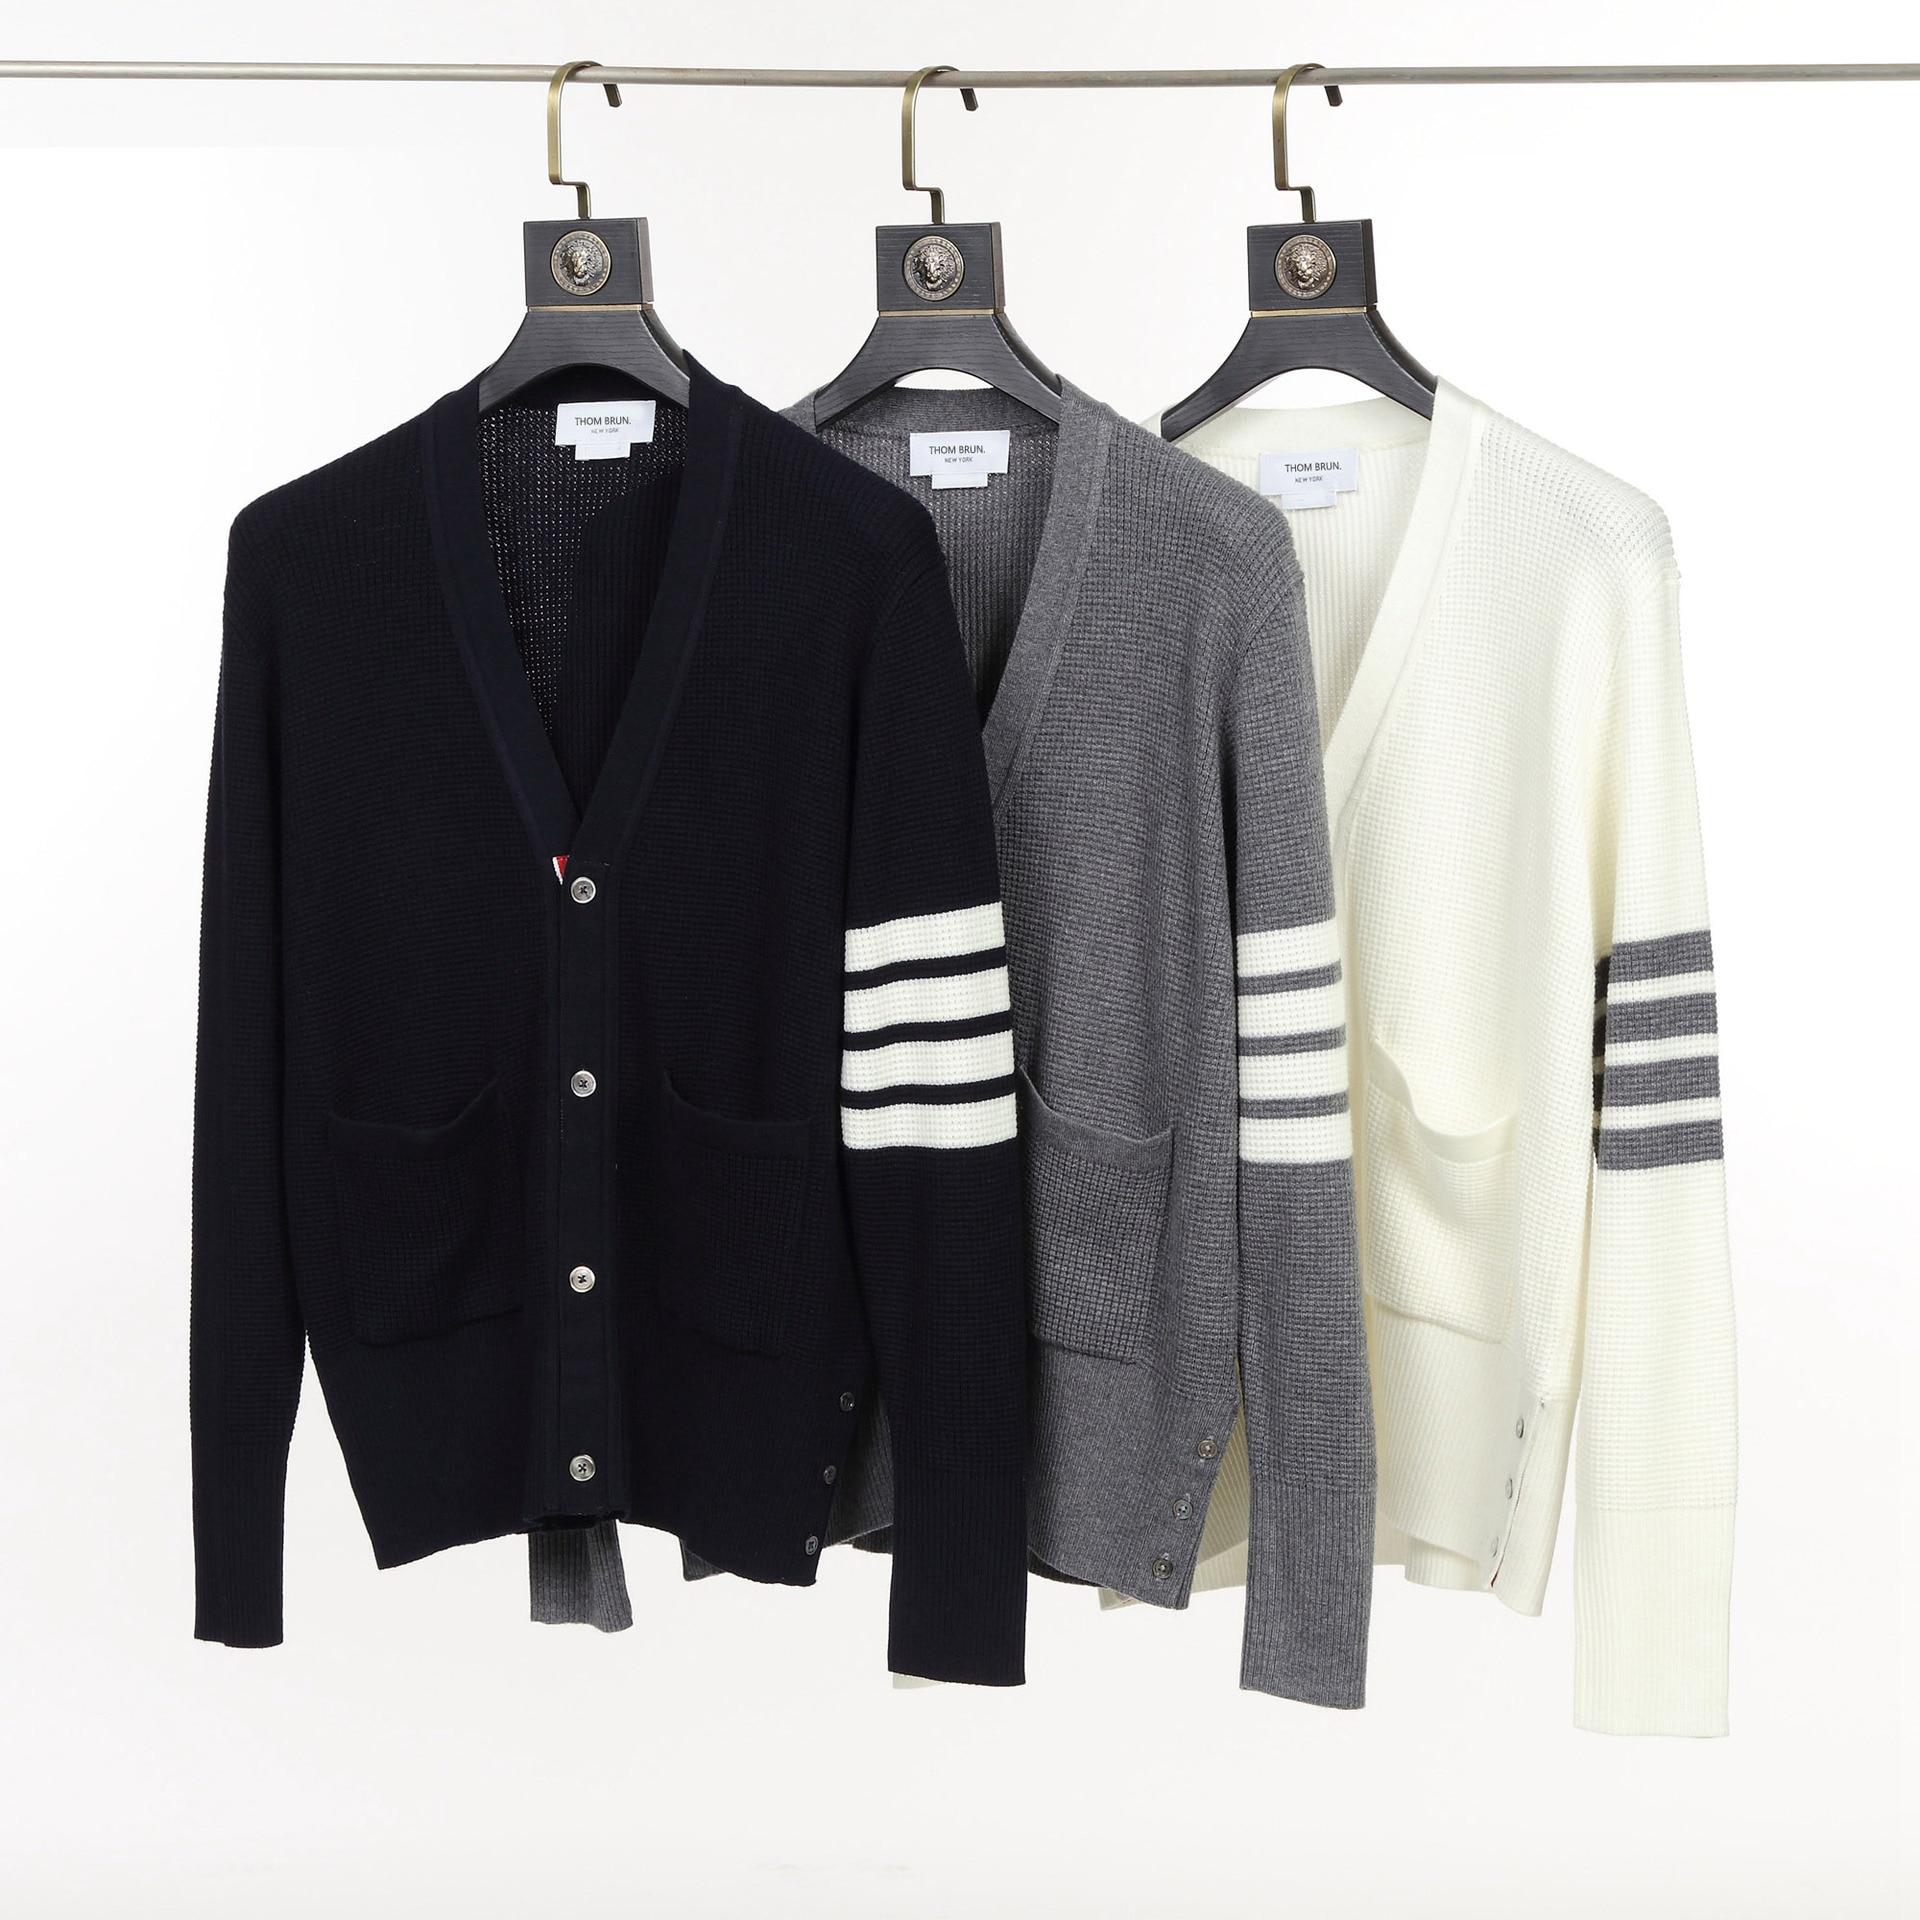 THOM Brand TB Sweater Men Women Casual Striped Wool V-Collar High Quality Cardigan Outerwear Pockets Waffle Design Korean